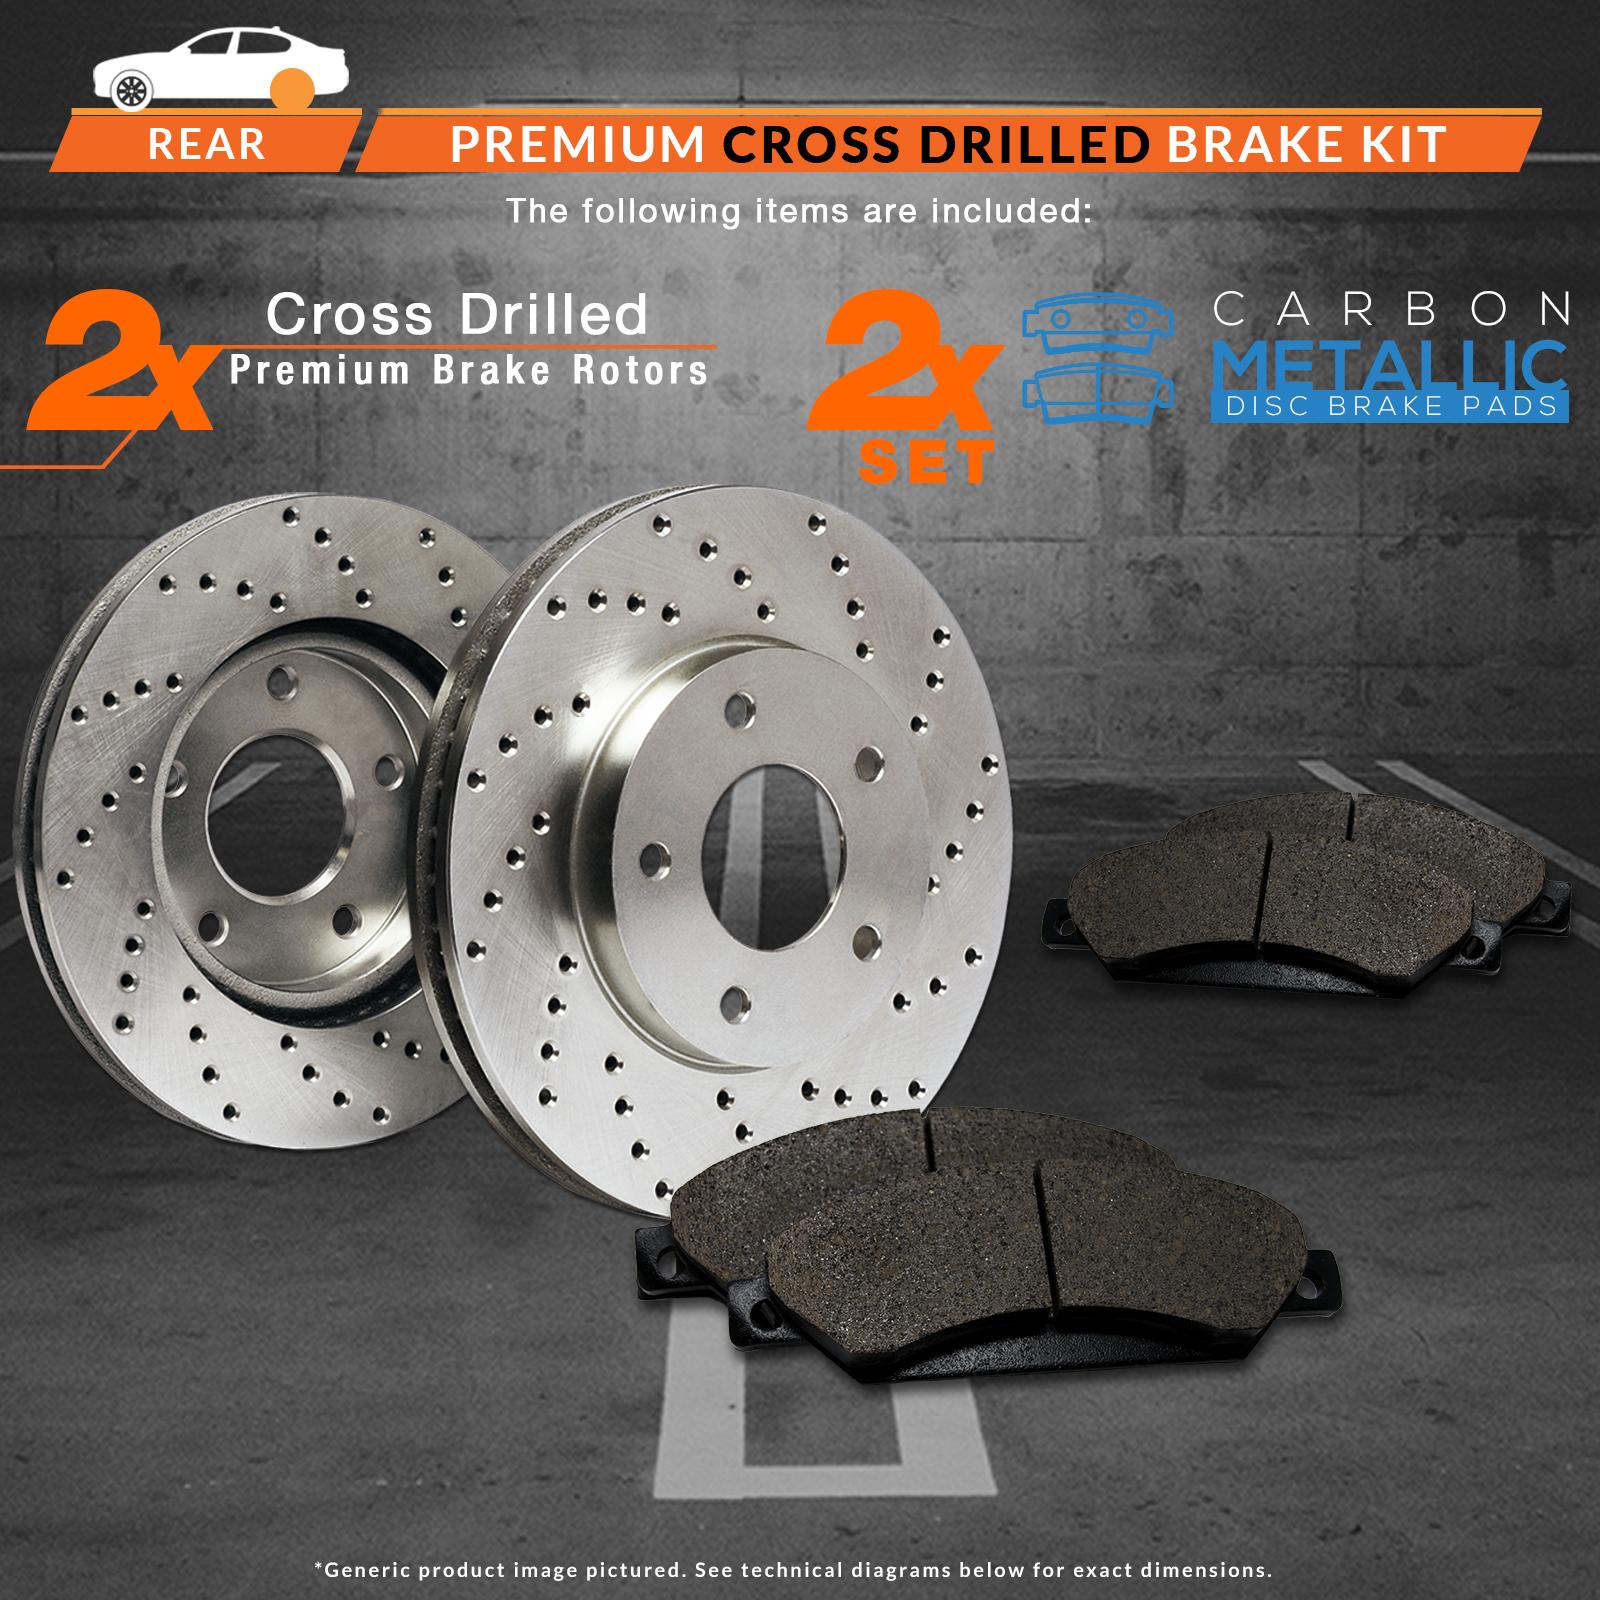 2013 2014 2015 Ford Taurus Non SHO Cross Drilled Rotors w/Metallic Pads R 2